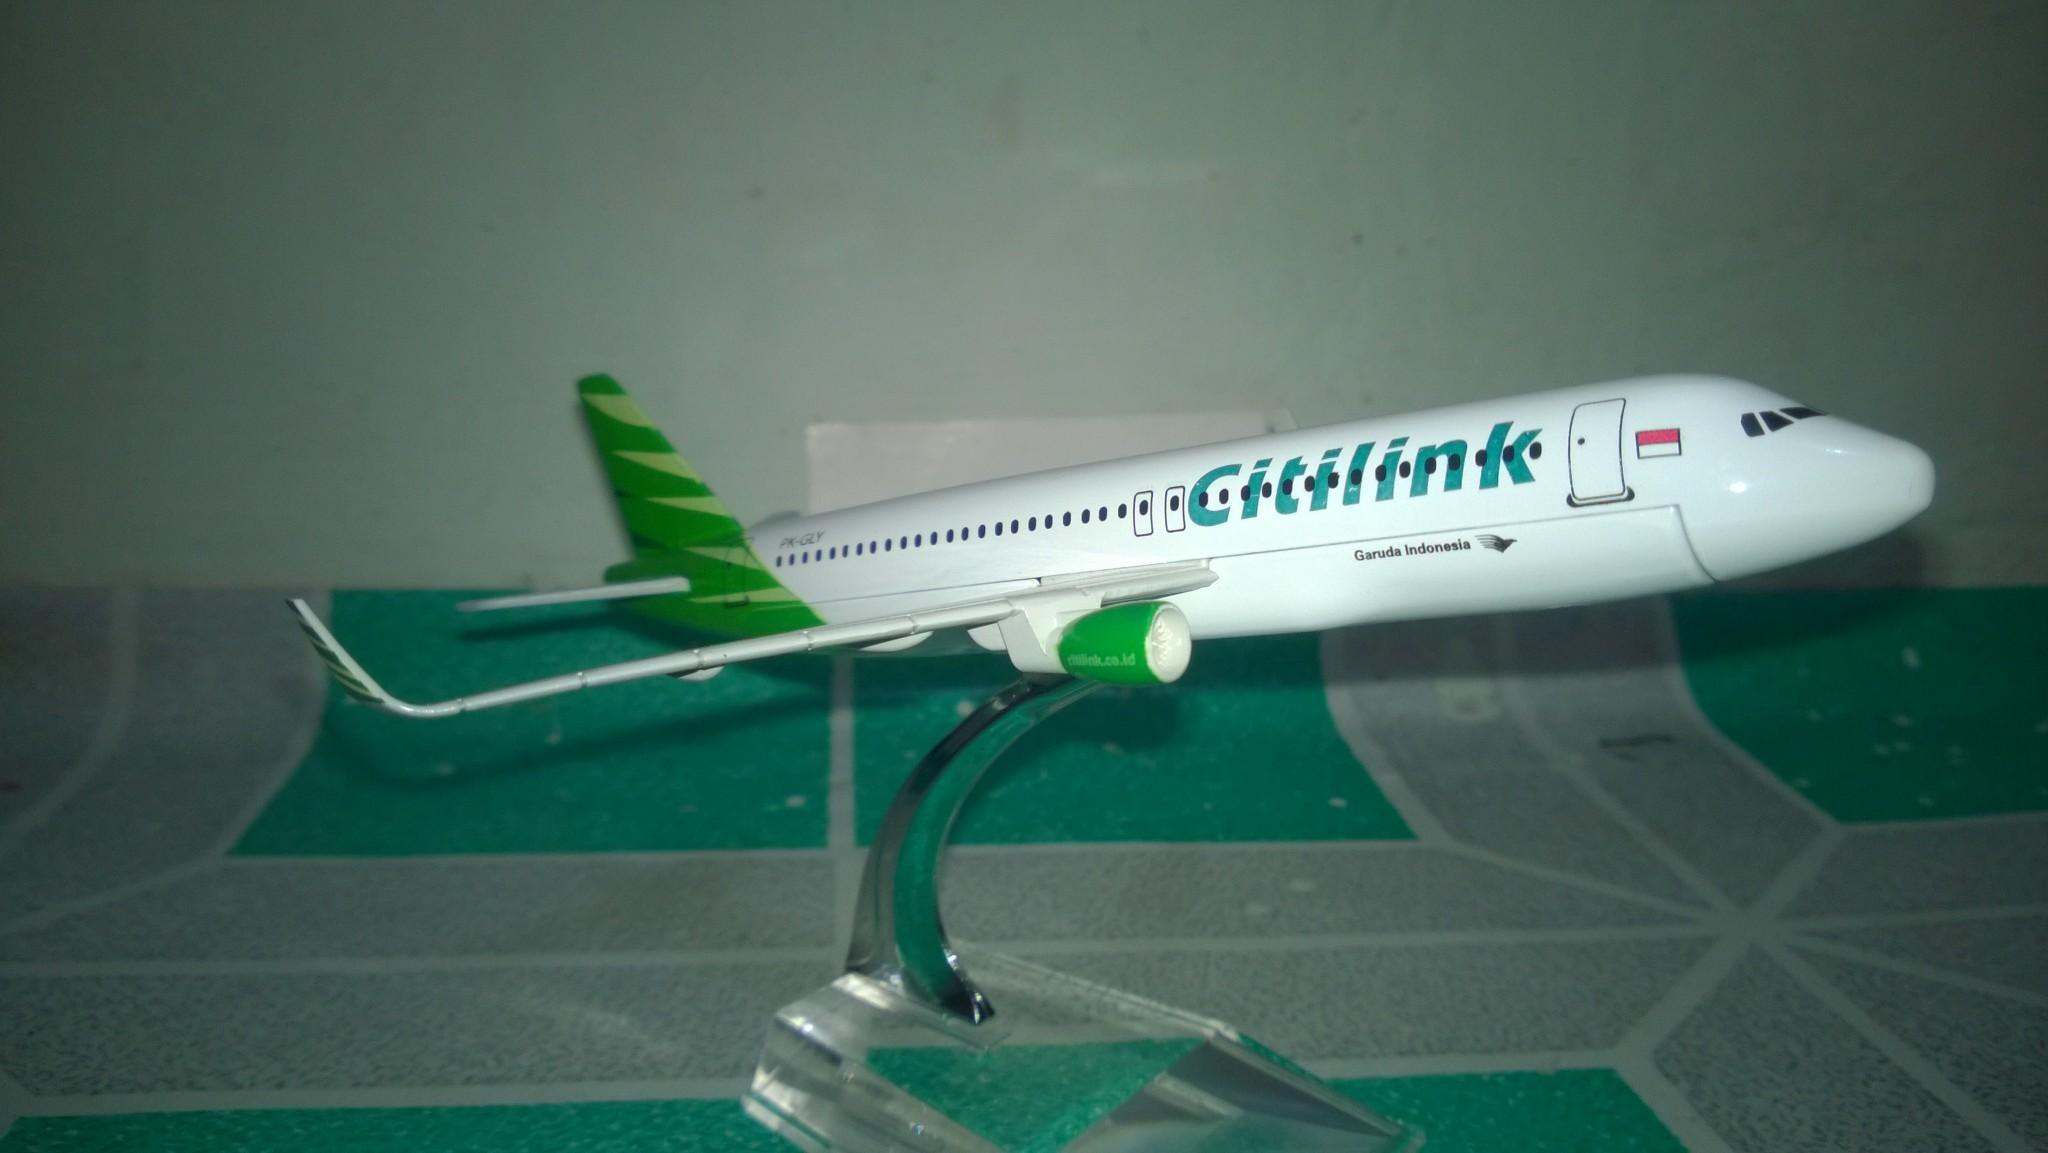 Jual Miniatur Pesawat Citlink Airbus 320 Ardian Toys Tokopedia Diecast Citilink